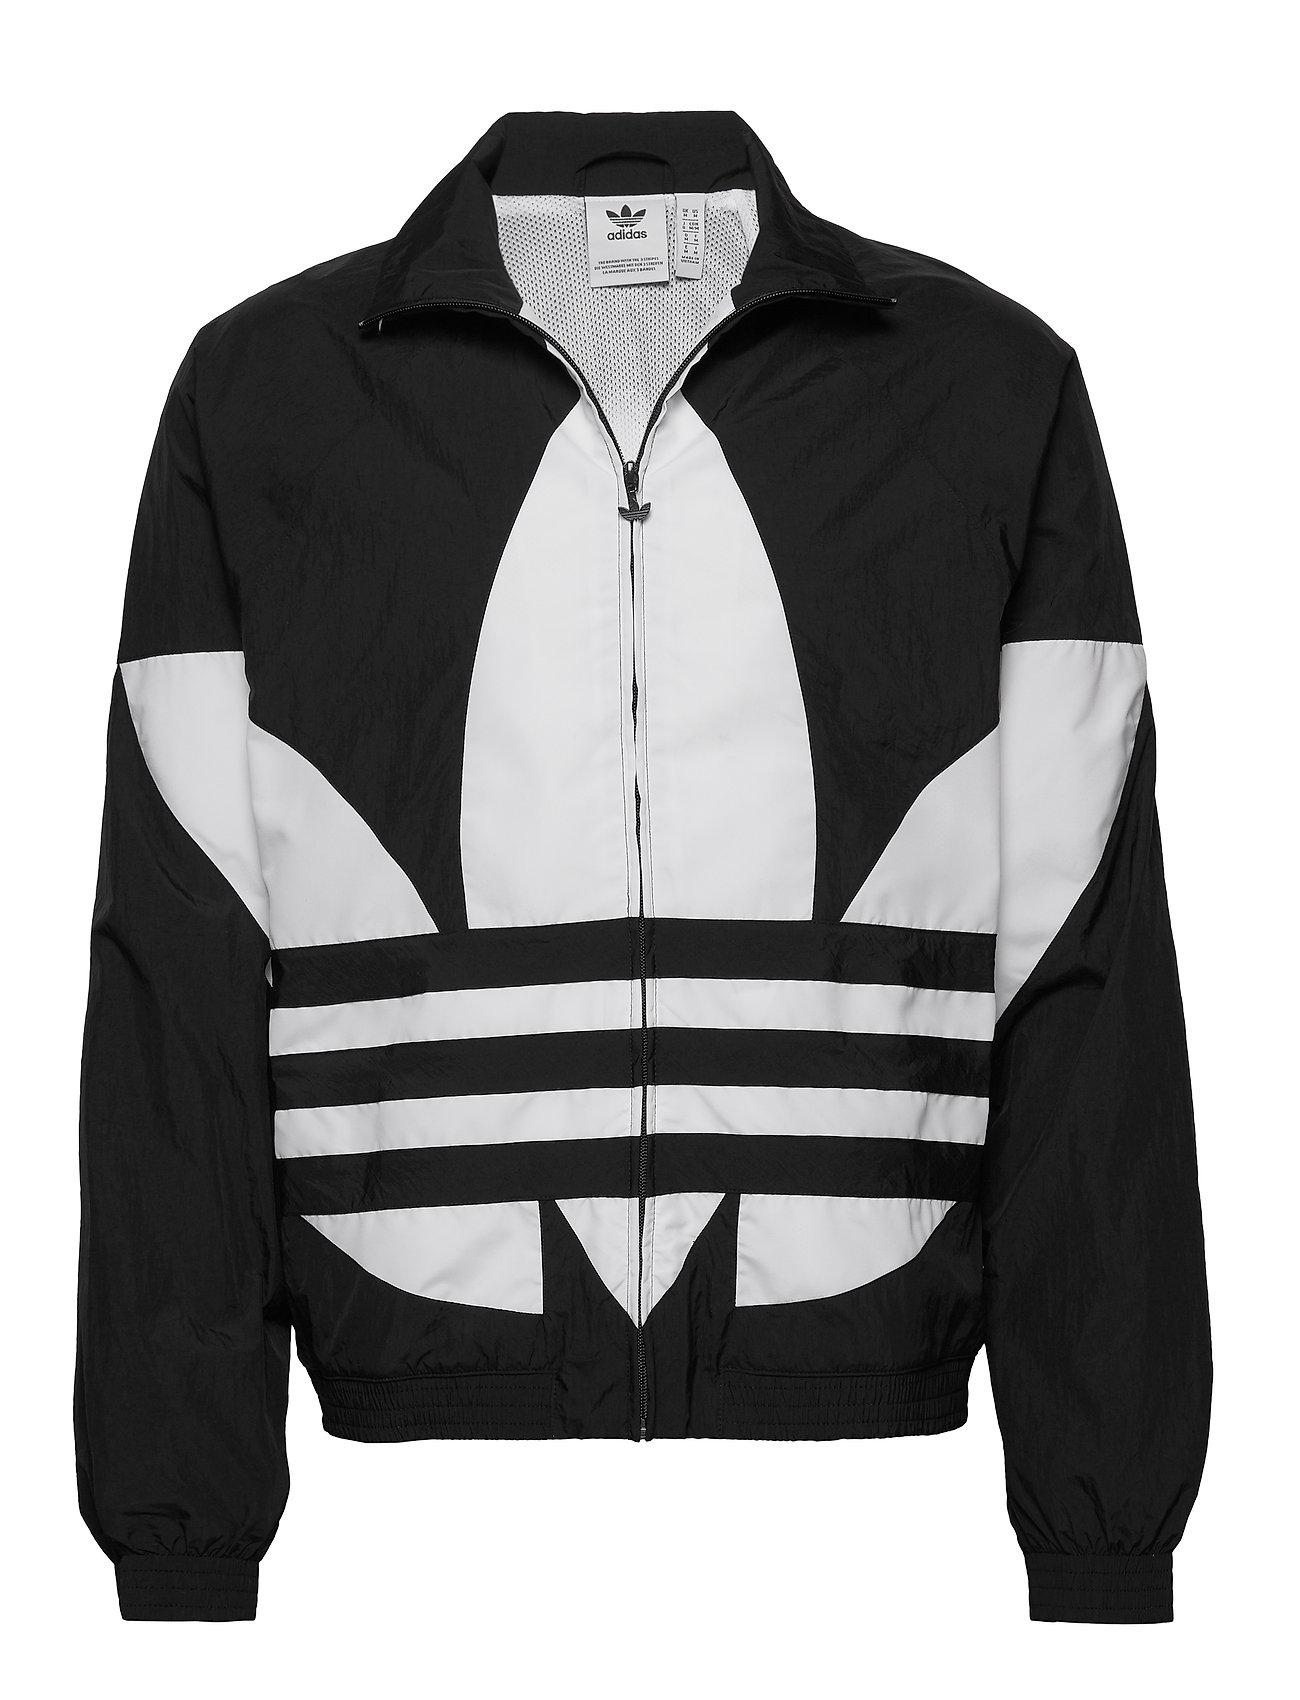 adidas Originals BG TREFOIL TT - BLACK